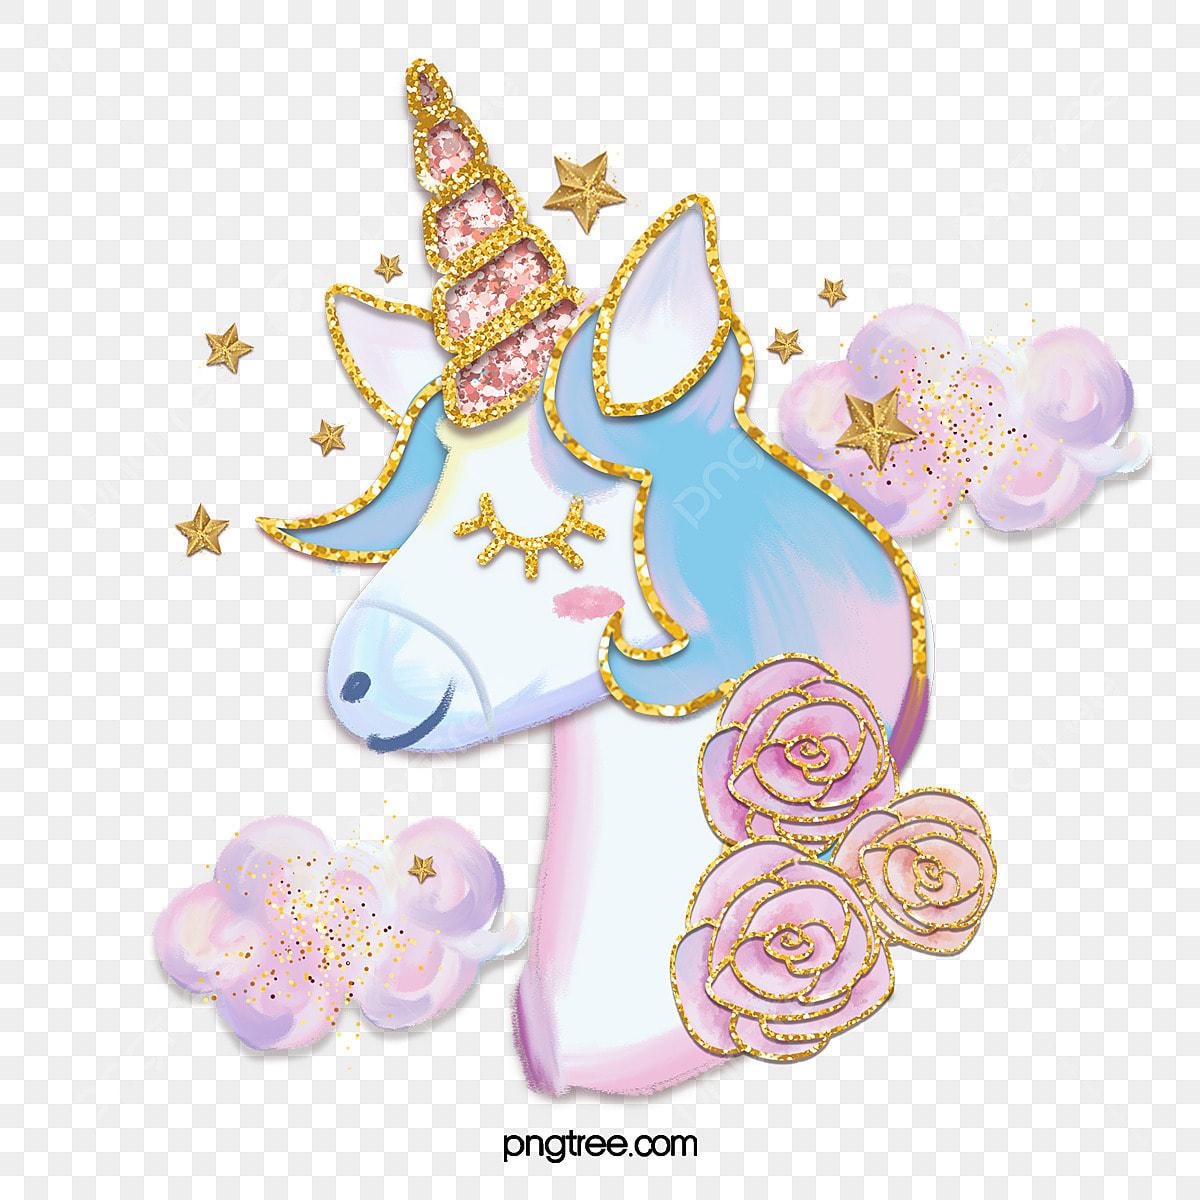 pngtree pink fantasy unicorn gold pink star rose png image 5333573